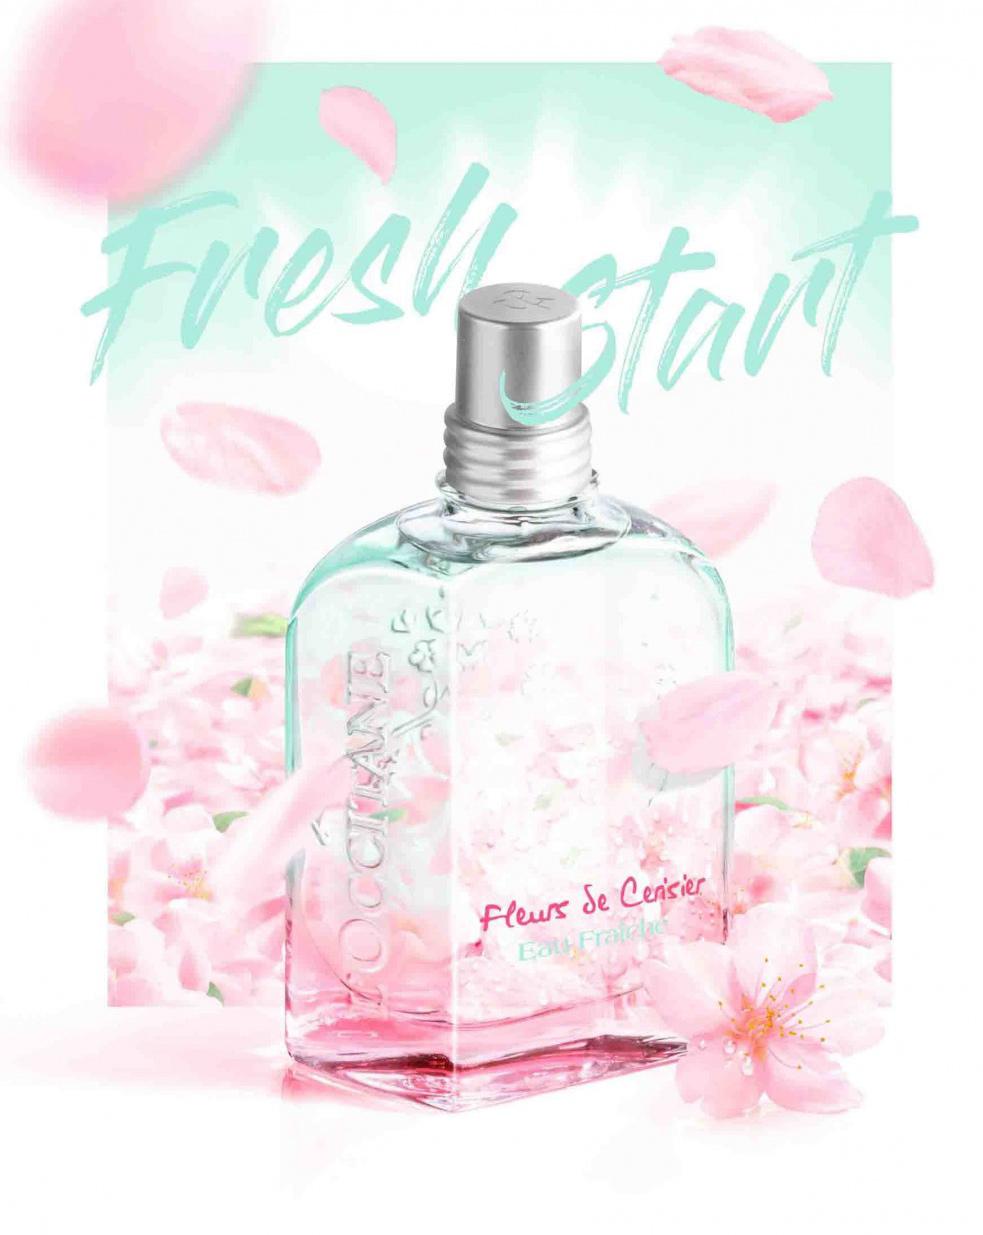 fleurs de cerisier eau fra che l 39 occitane en provence perfume a new fragrance for women 2018. Black Bedroom Furniture Sets. Home Design Ideas